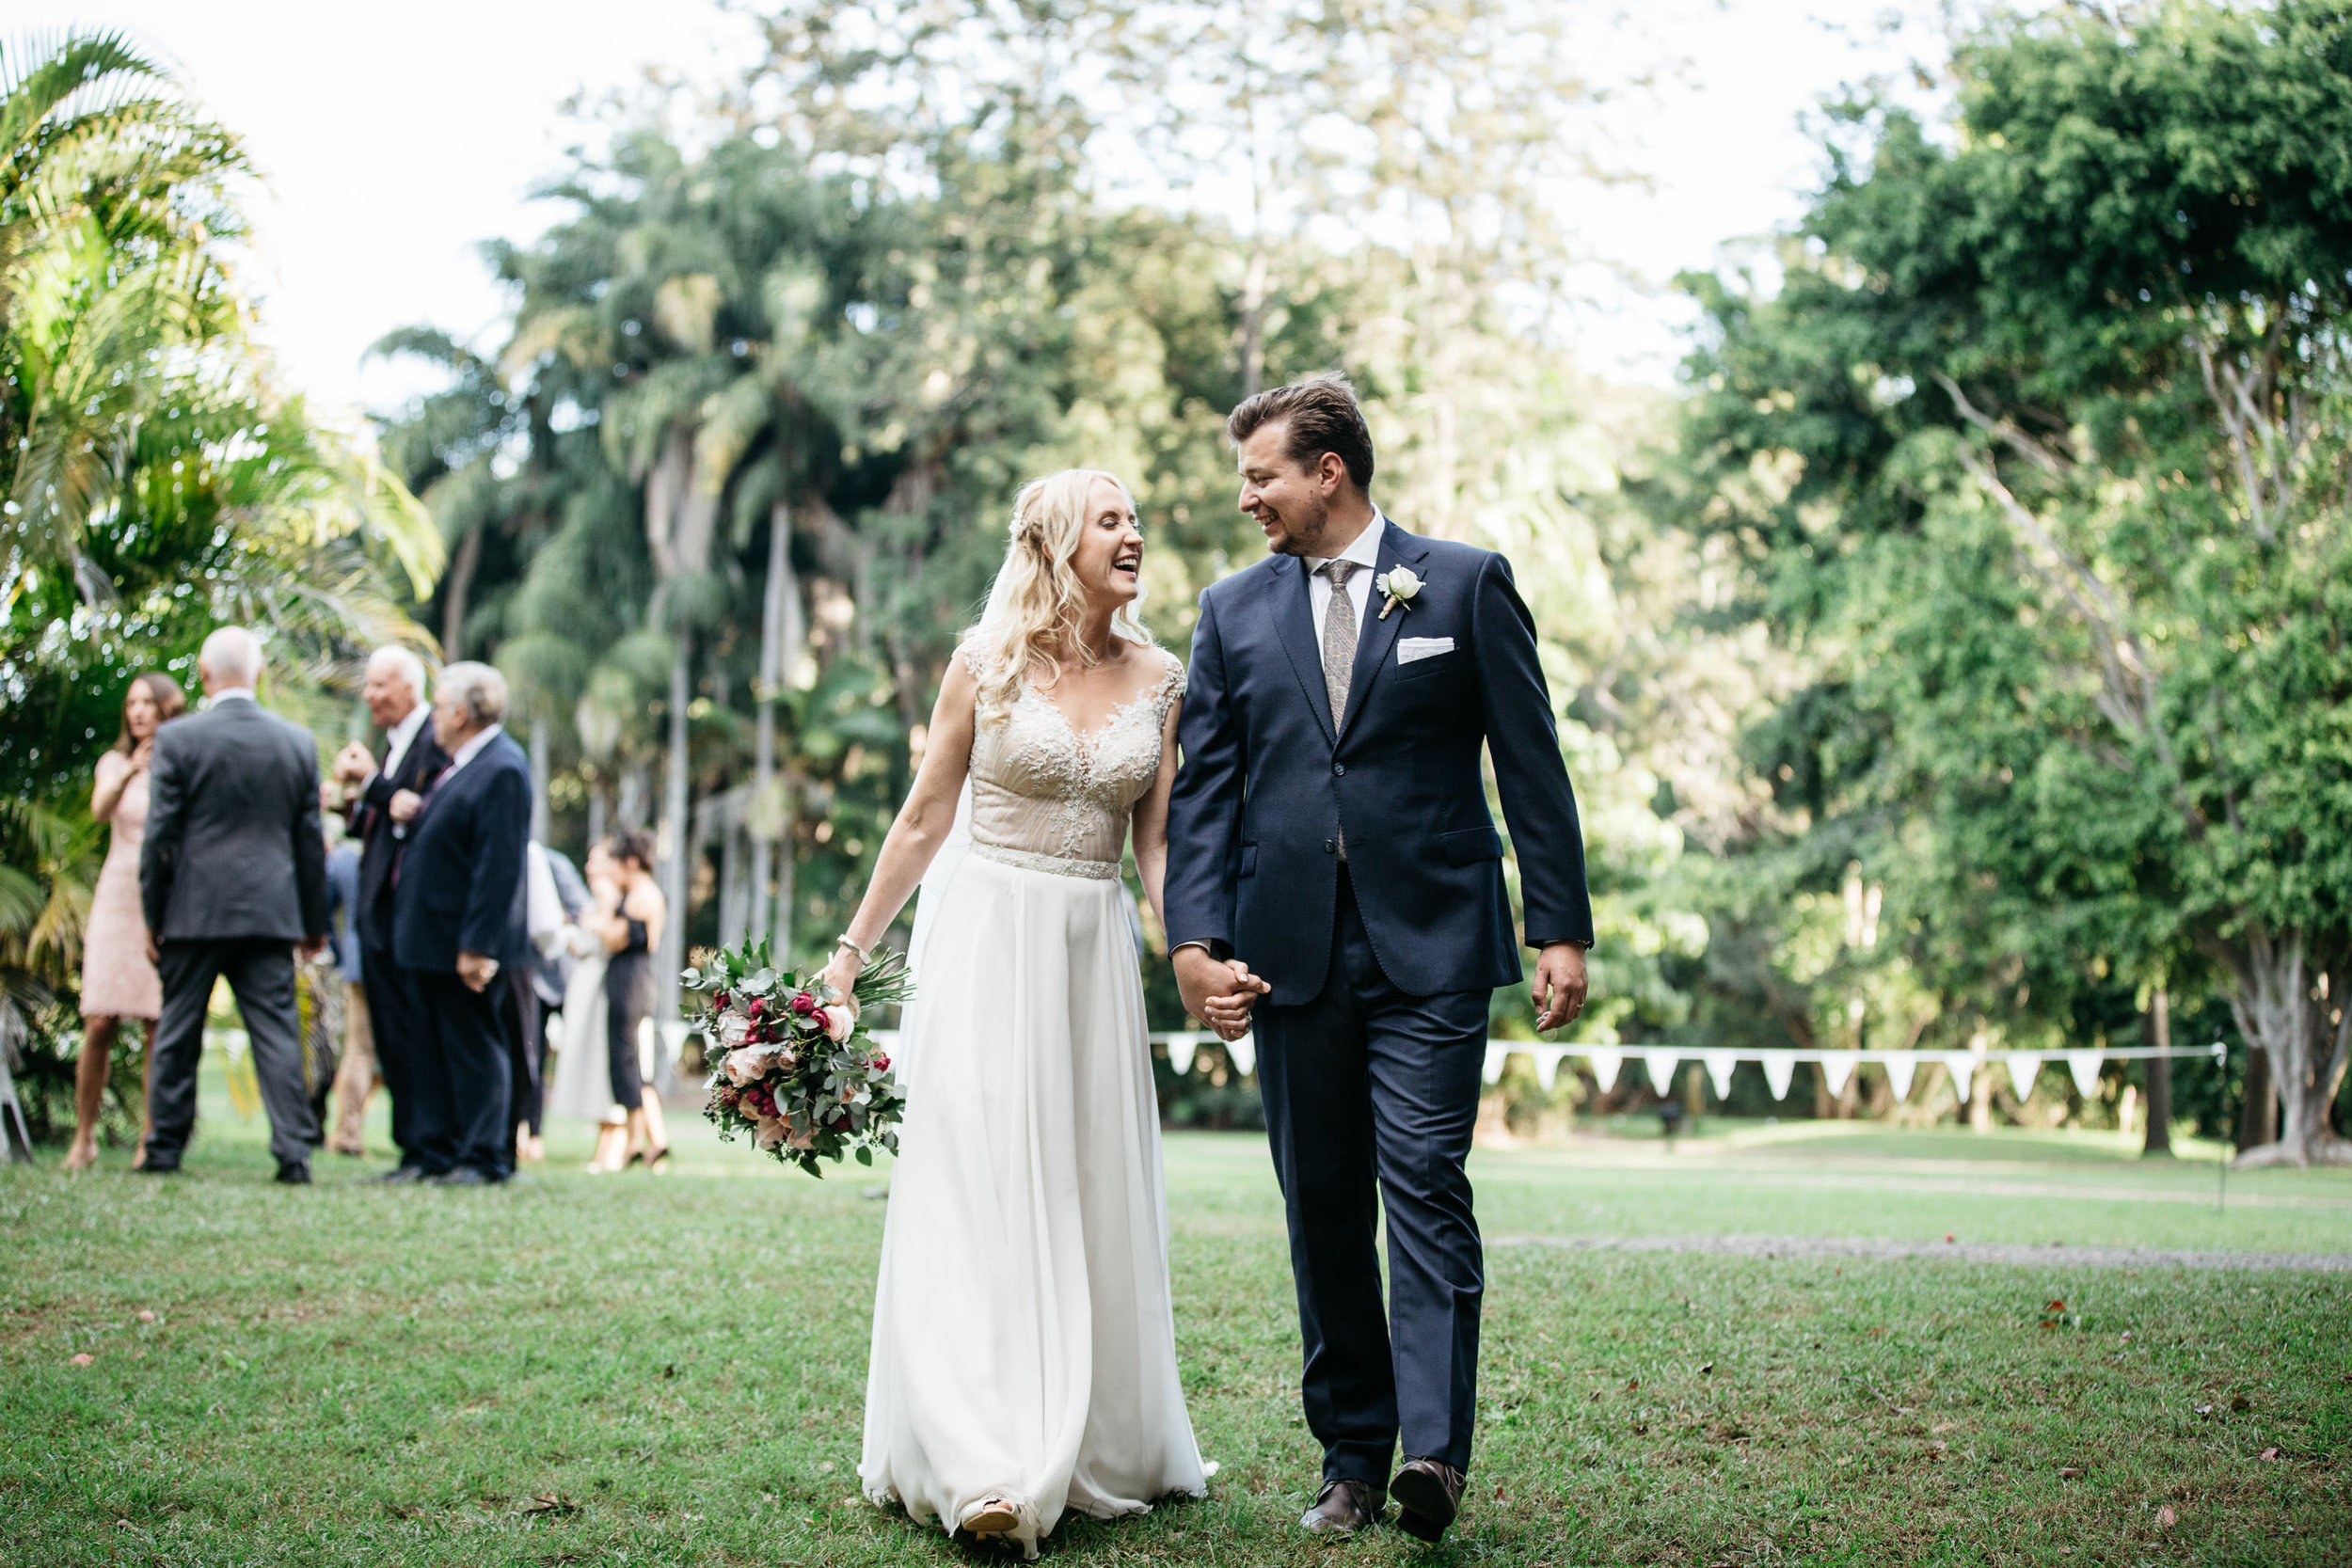 True North Photography_Boomerang Farm_Stacey and Isaac_Gold Coast Wedding_Barm Wedding_Hinterland Wedding-129.jpg